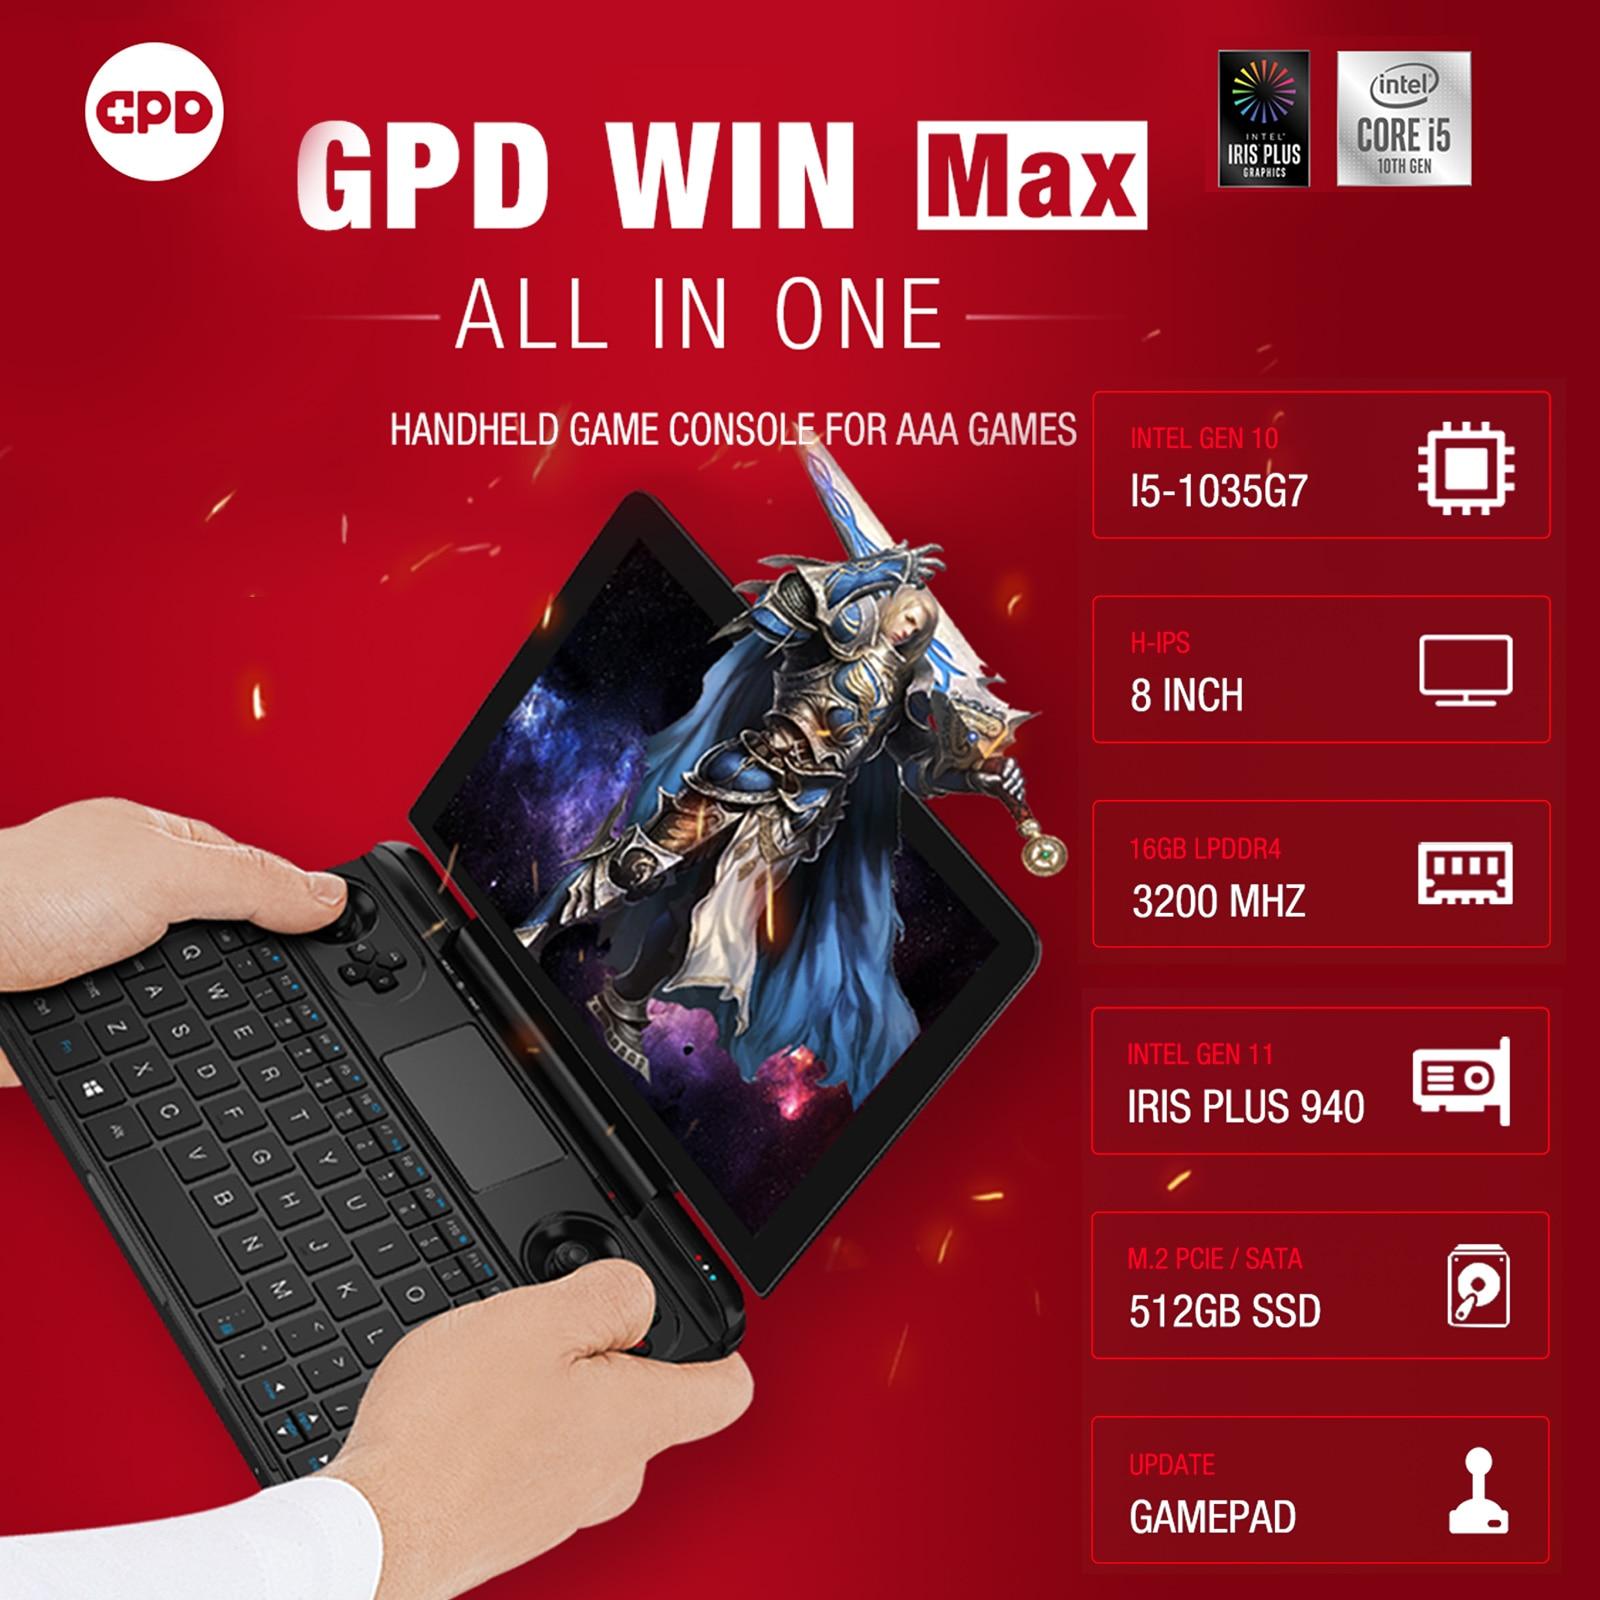 "GPD WIN MAX Mini Gaming Laptop 8 ""Touchscreen Handheld Spielkonsole PC Notebook 16GB/512GB Dual wiFi 15000mAh Batterie Hintergrundbeleuchtung"